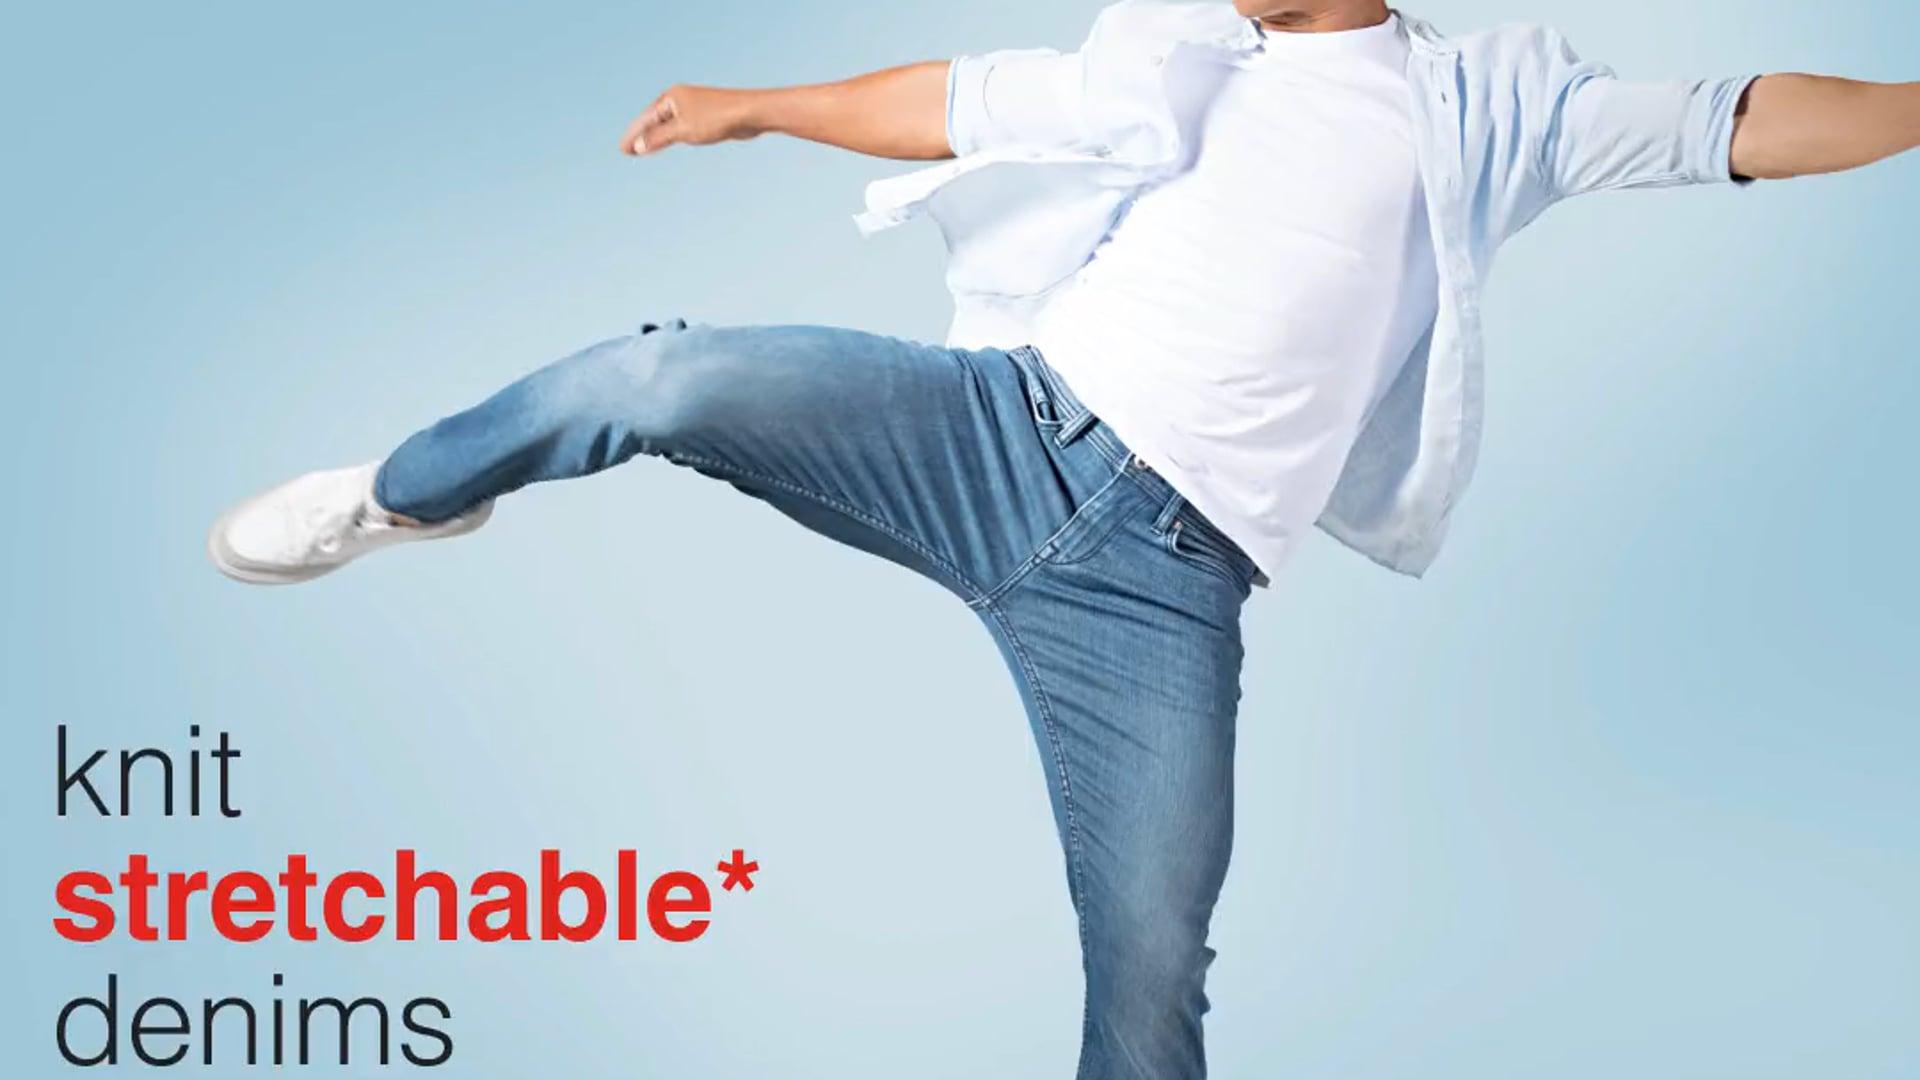 Celio x Sunil chhetri Knit stretchable Denims V4